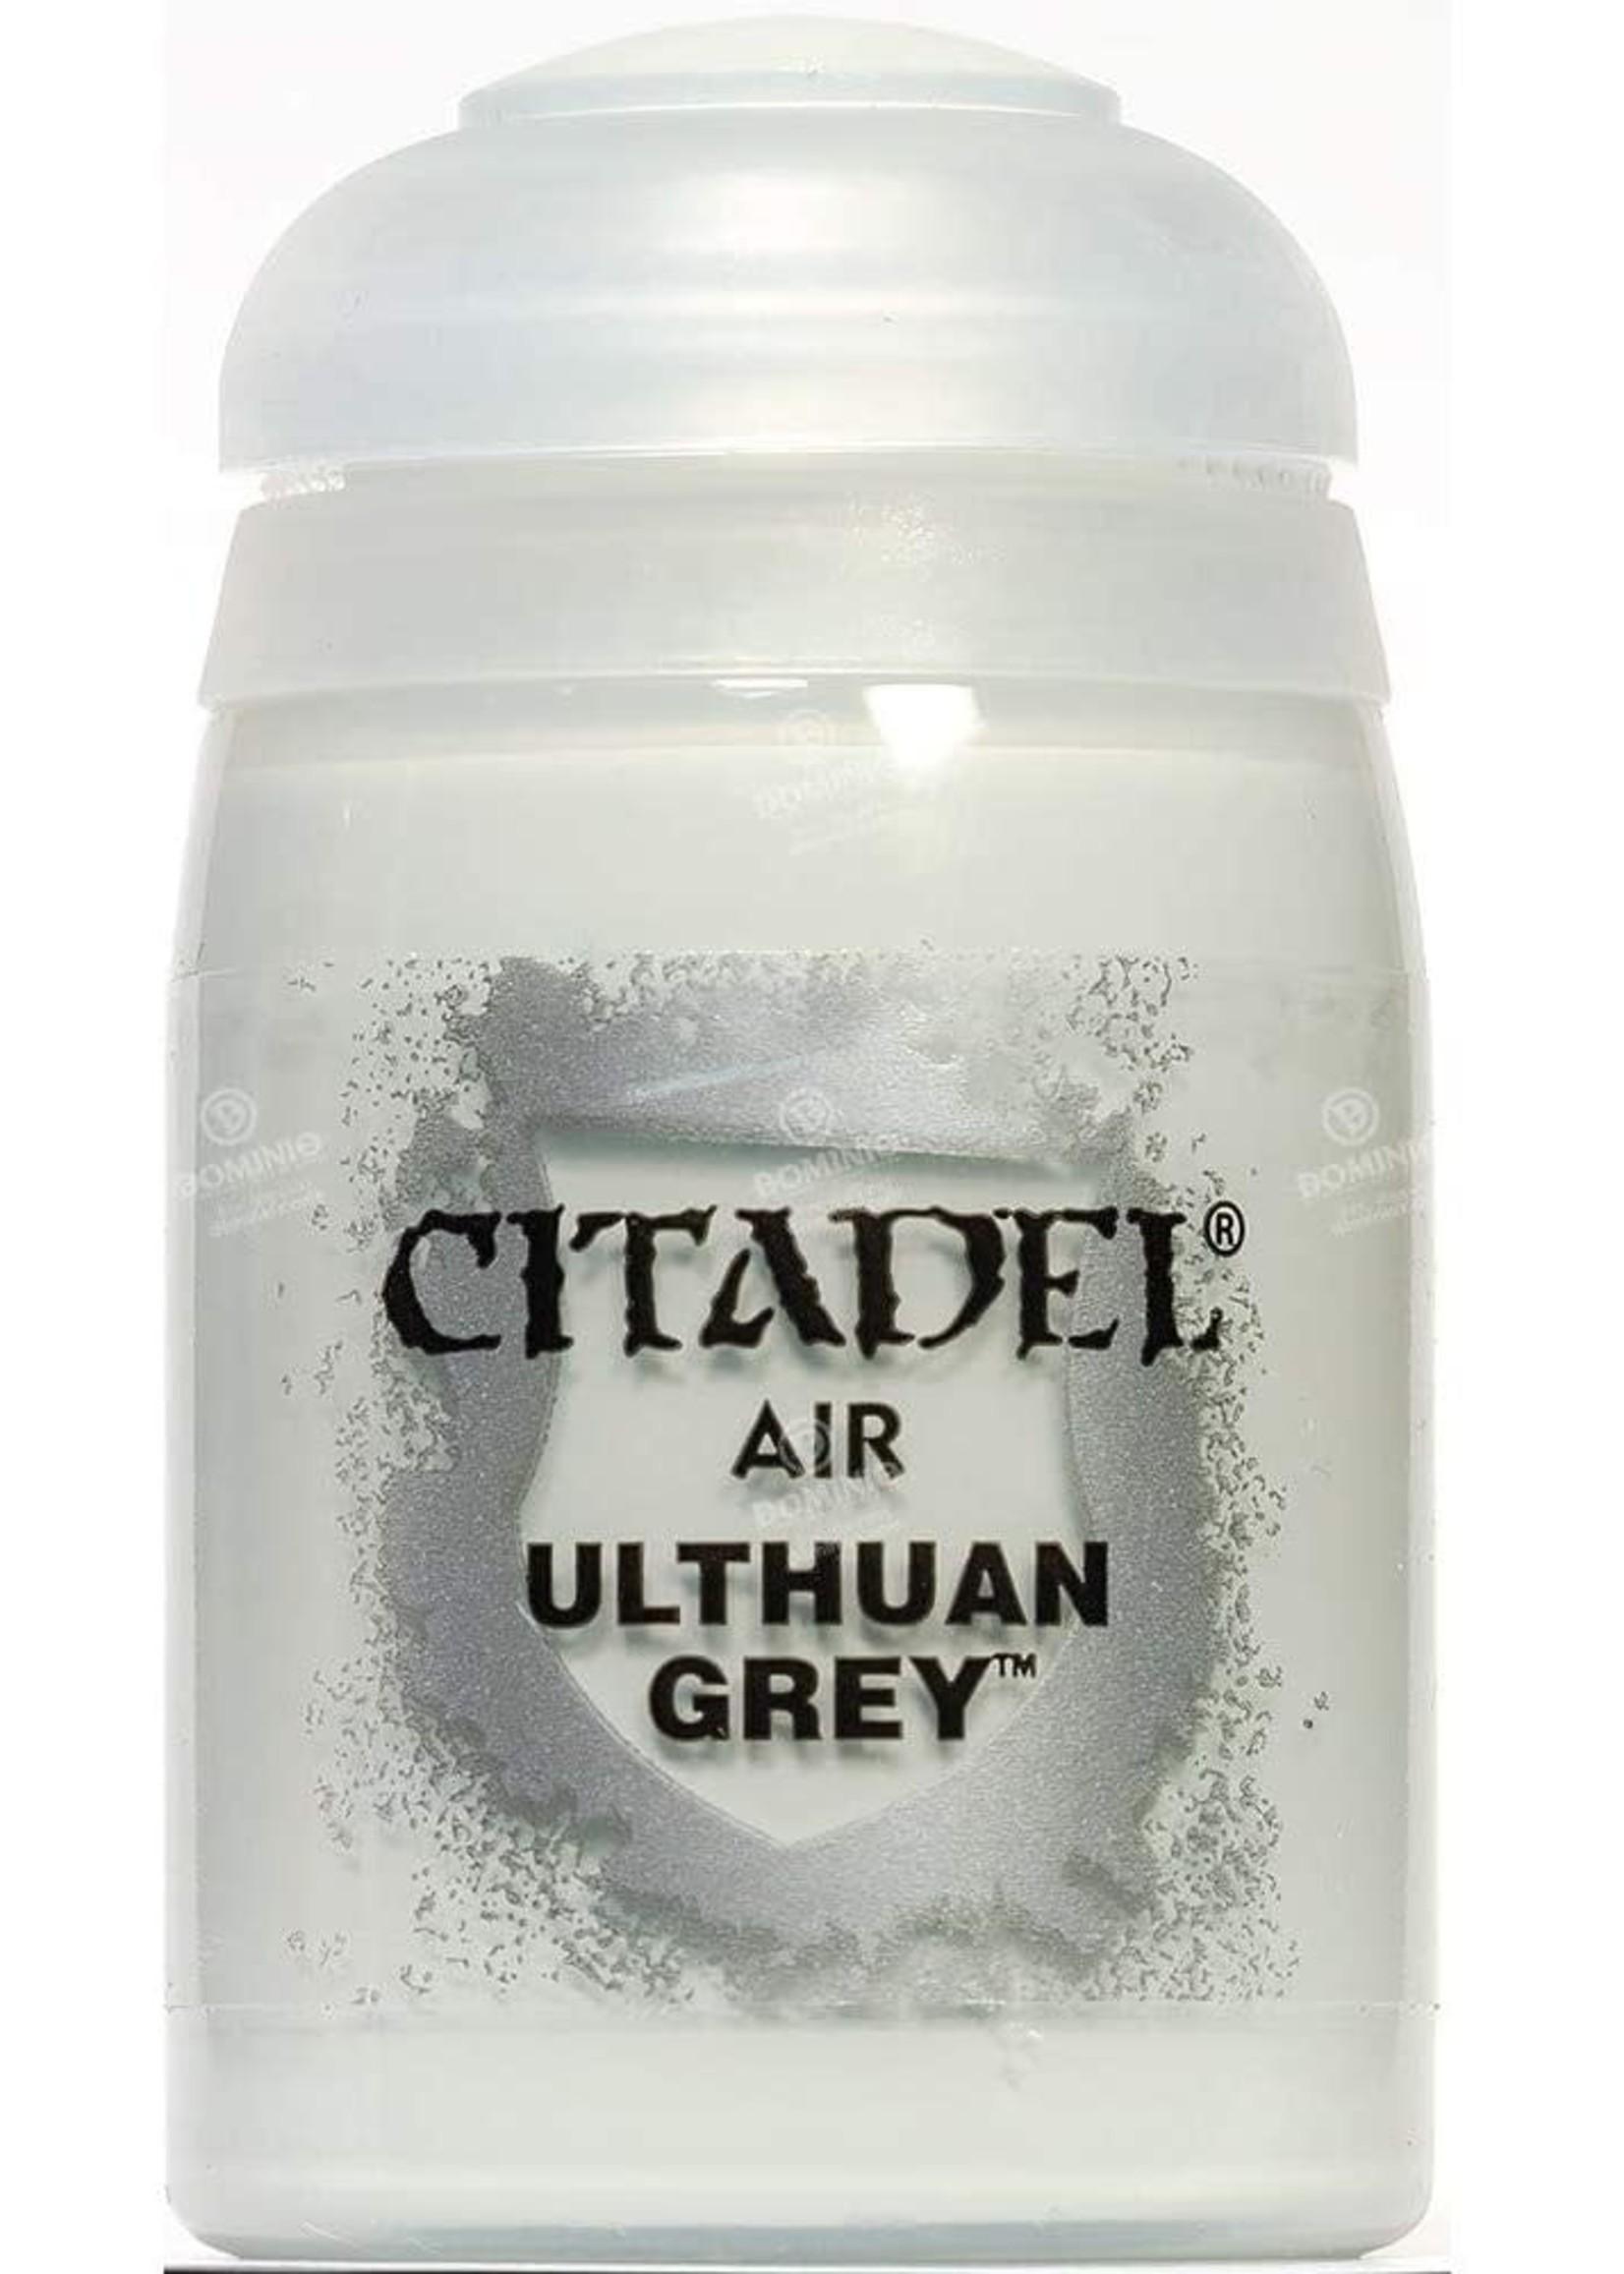 Games Workshop Citadel Paint: Ulthuan Grey Air (24 ml)